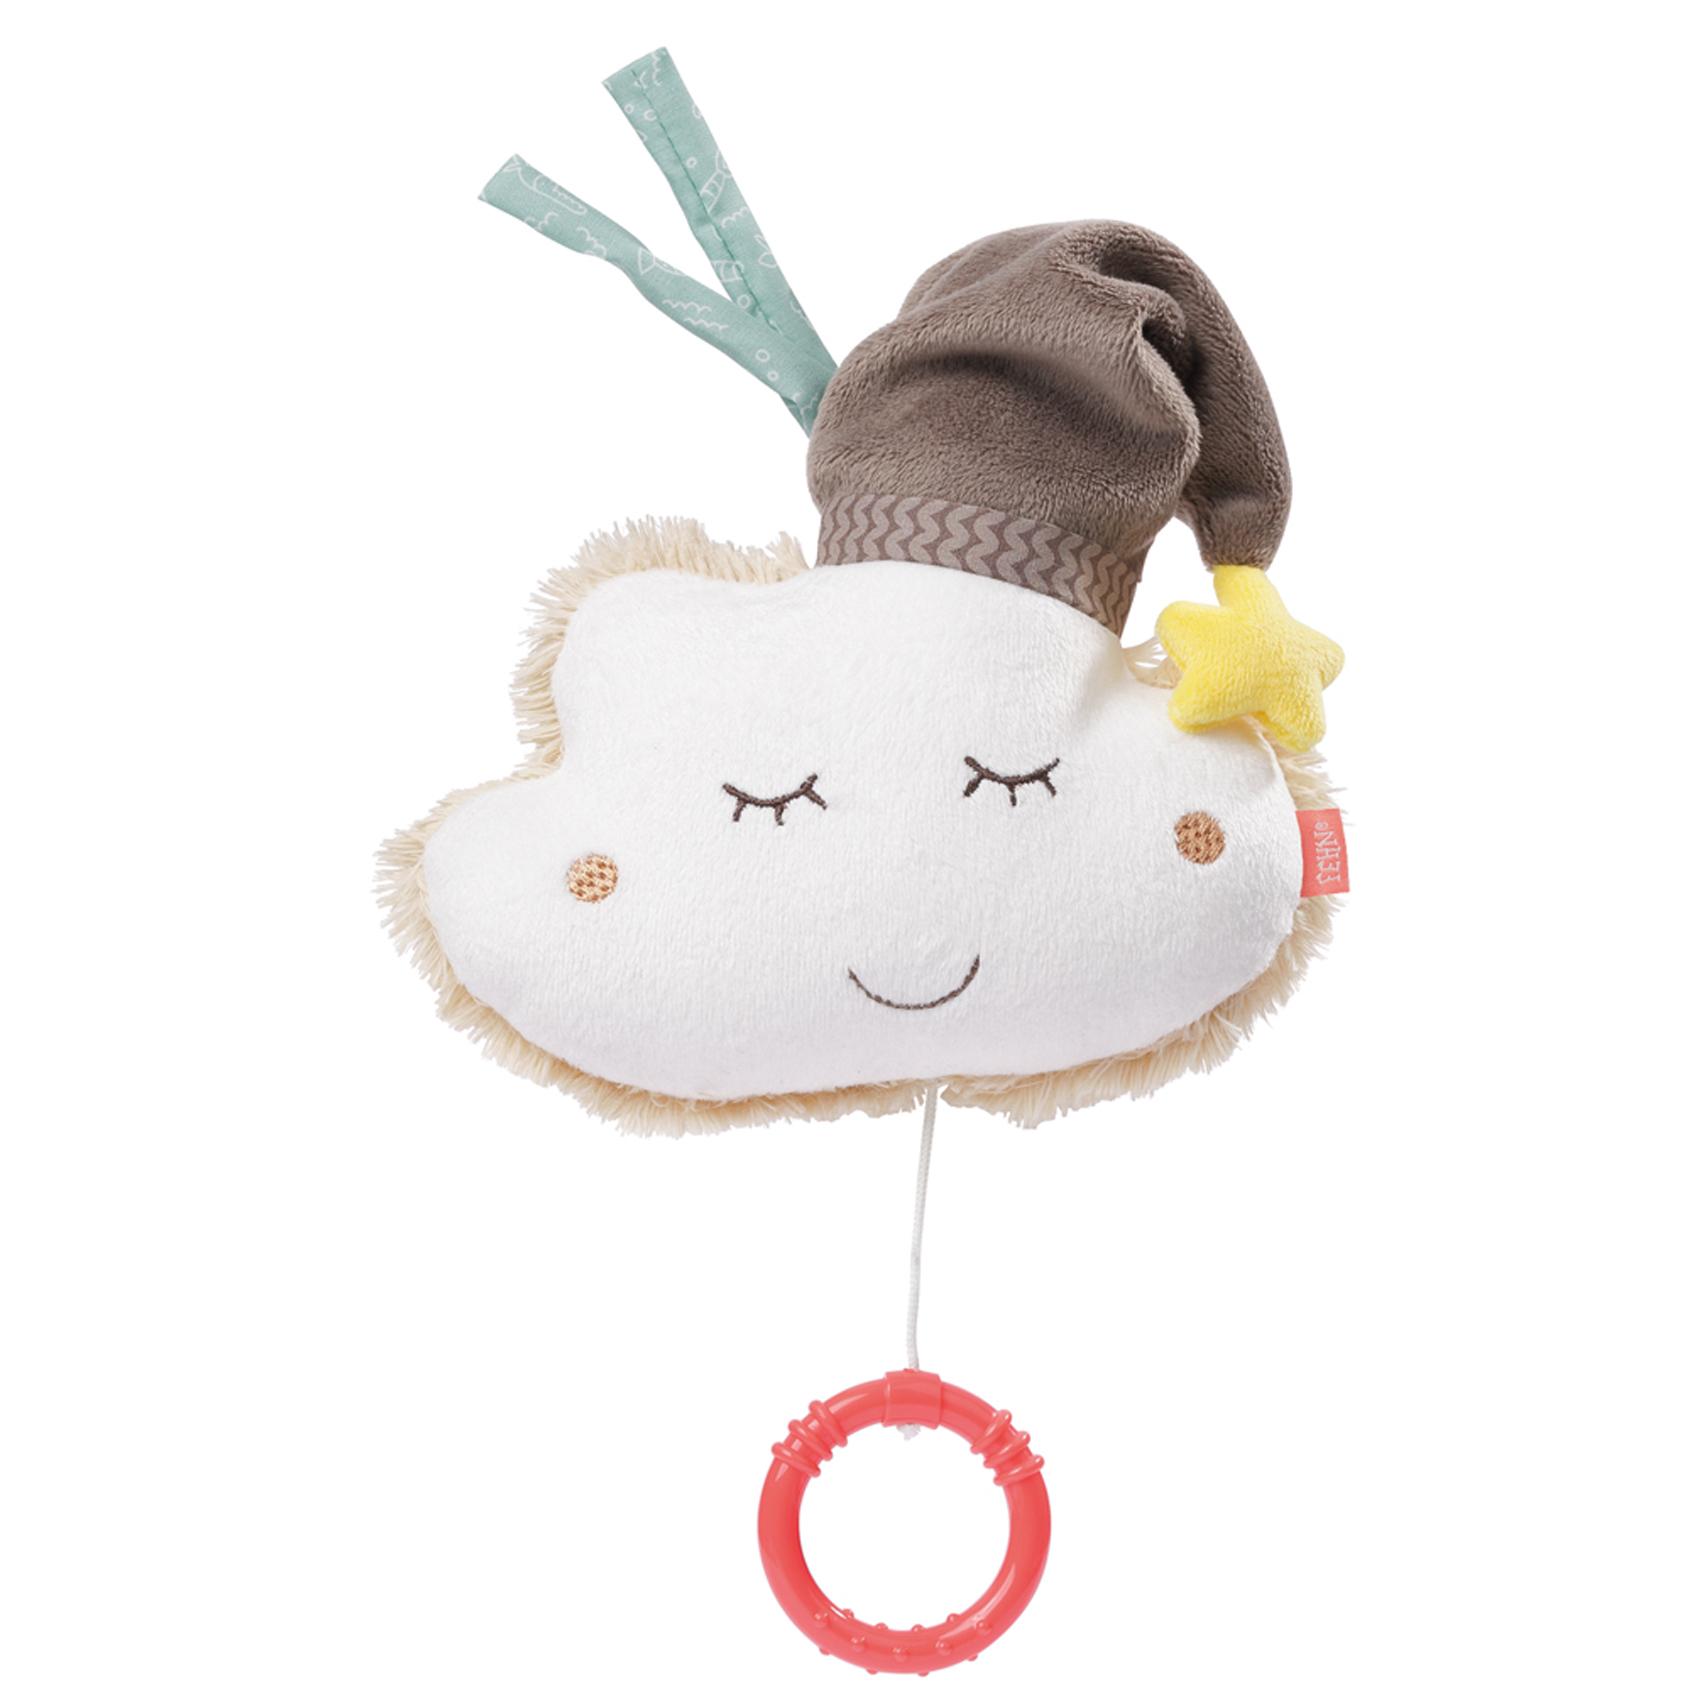 Peluche musicale bébé nuage Ecru/Chocolat 14 cm